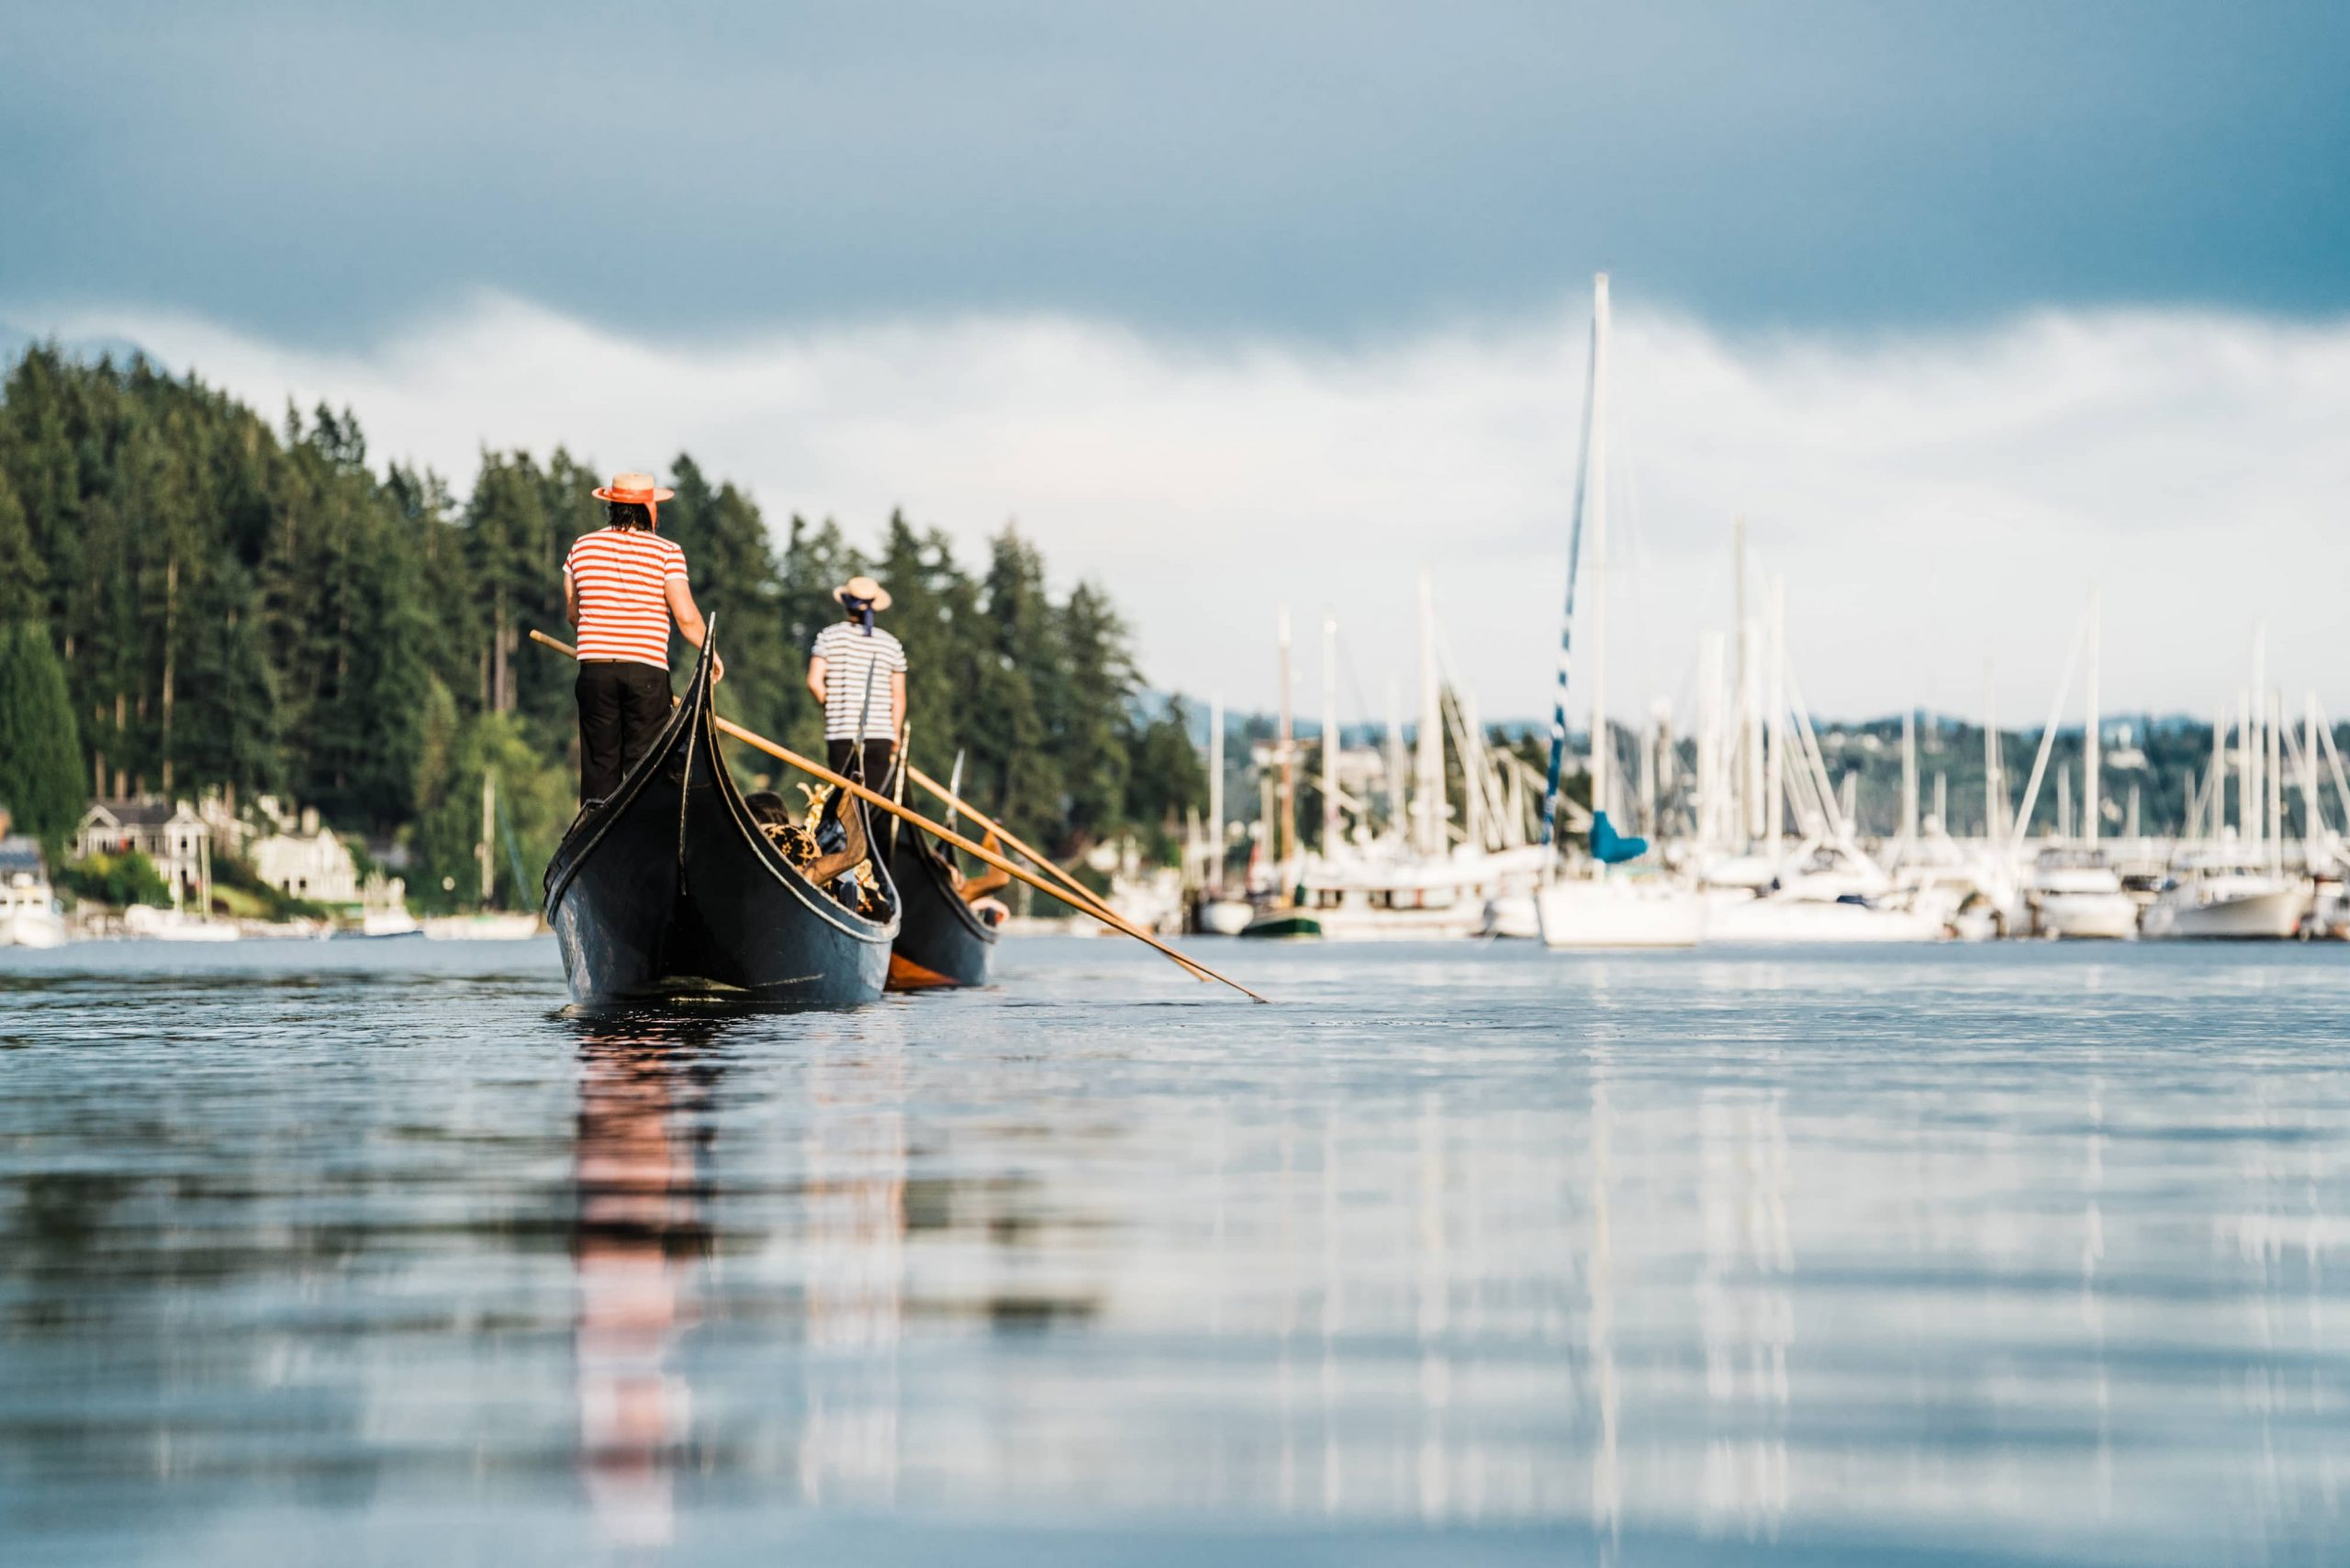 The Gig Harbor Gondola boats rowing in tandem towards sailboats.